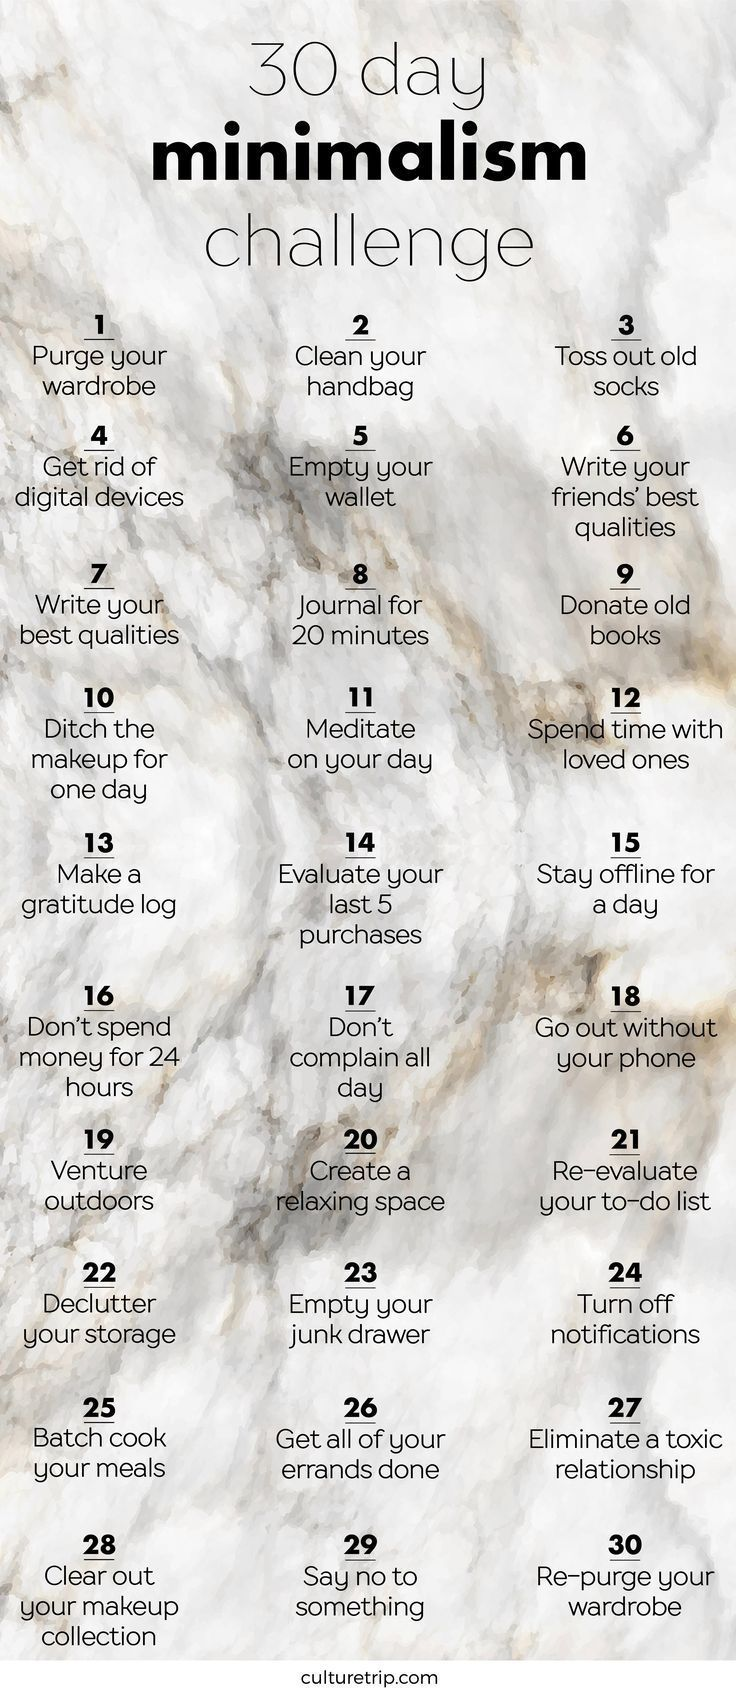 Die 30-Tage-Minimalismus-Herausforderung #30TageM…